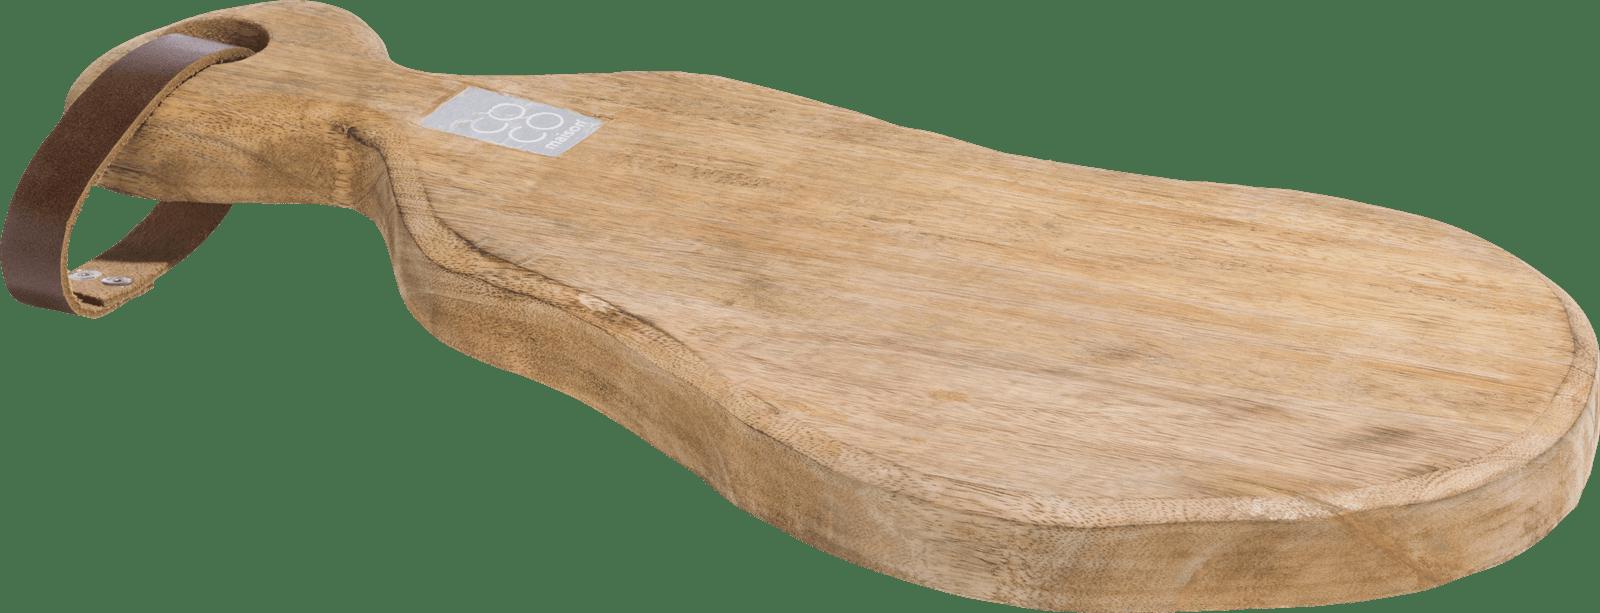 Coco Maison - snijplank mandra - 30 x 51 cm